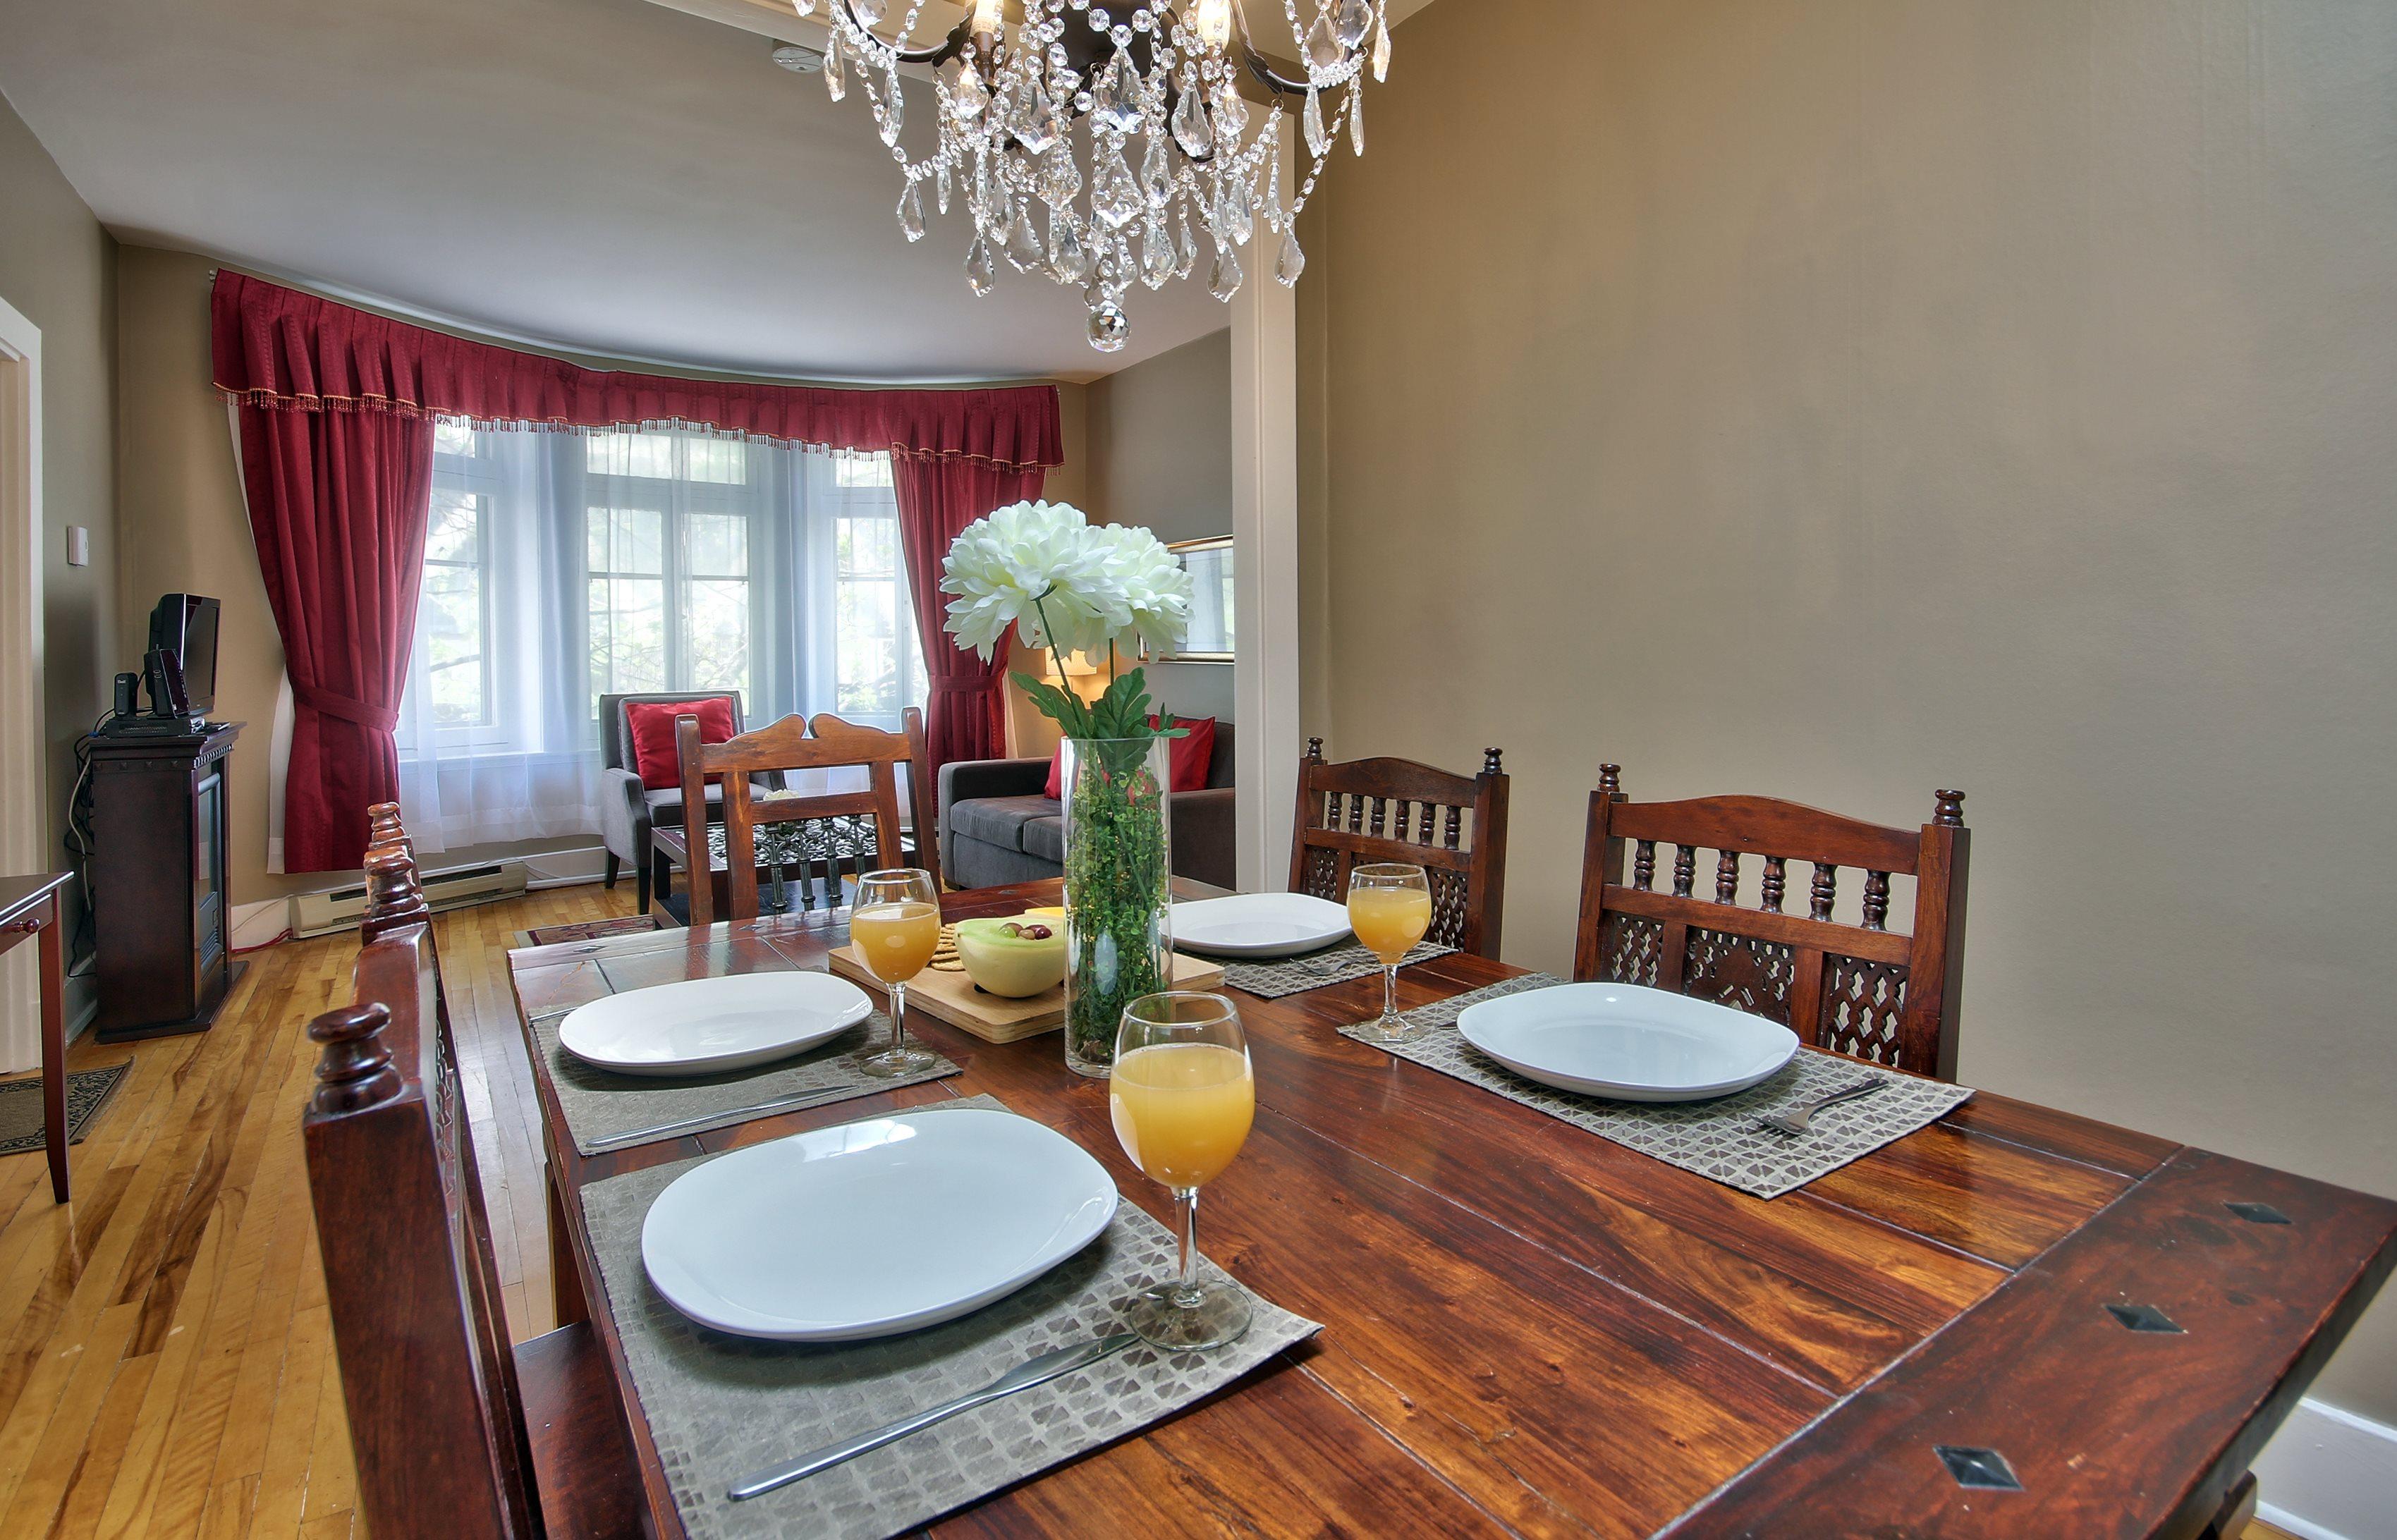 Suite Belle - Dining Room